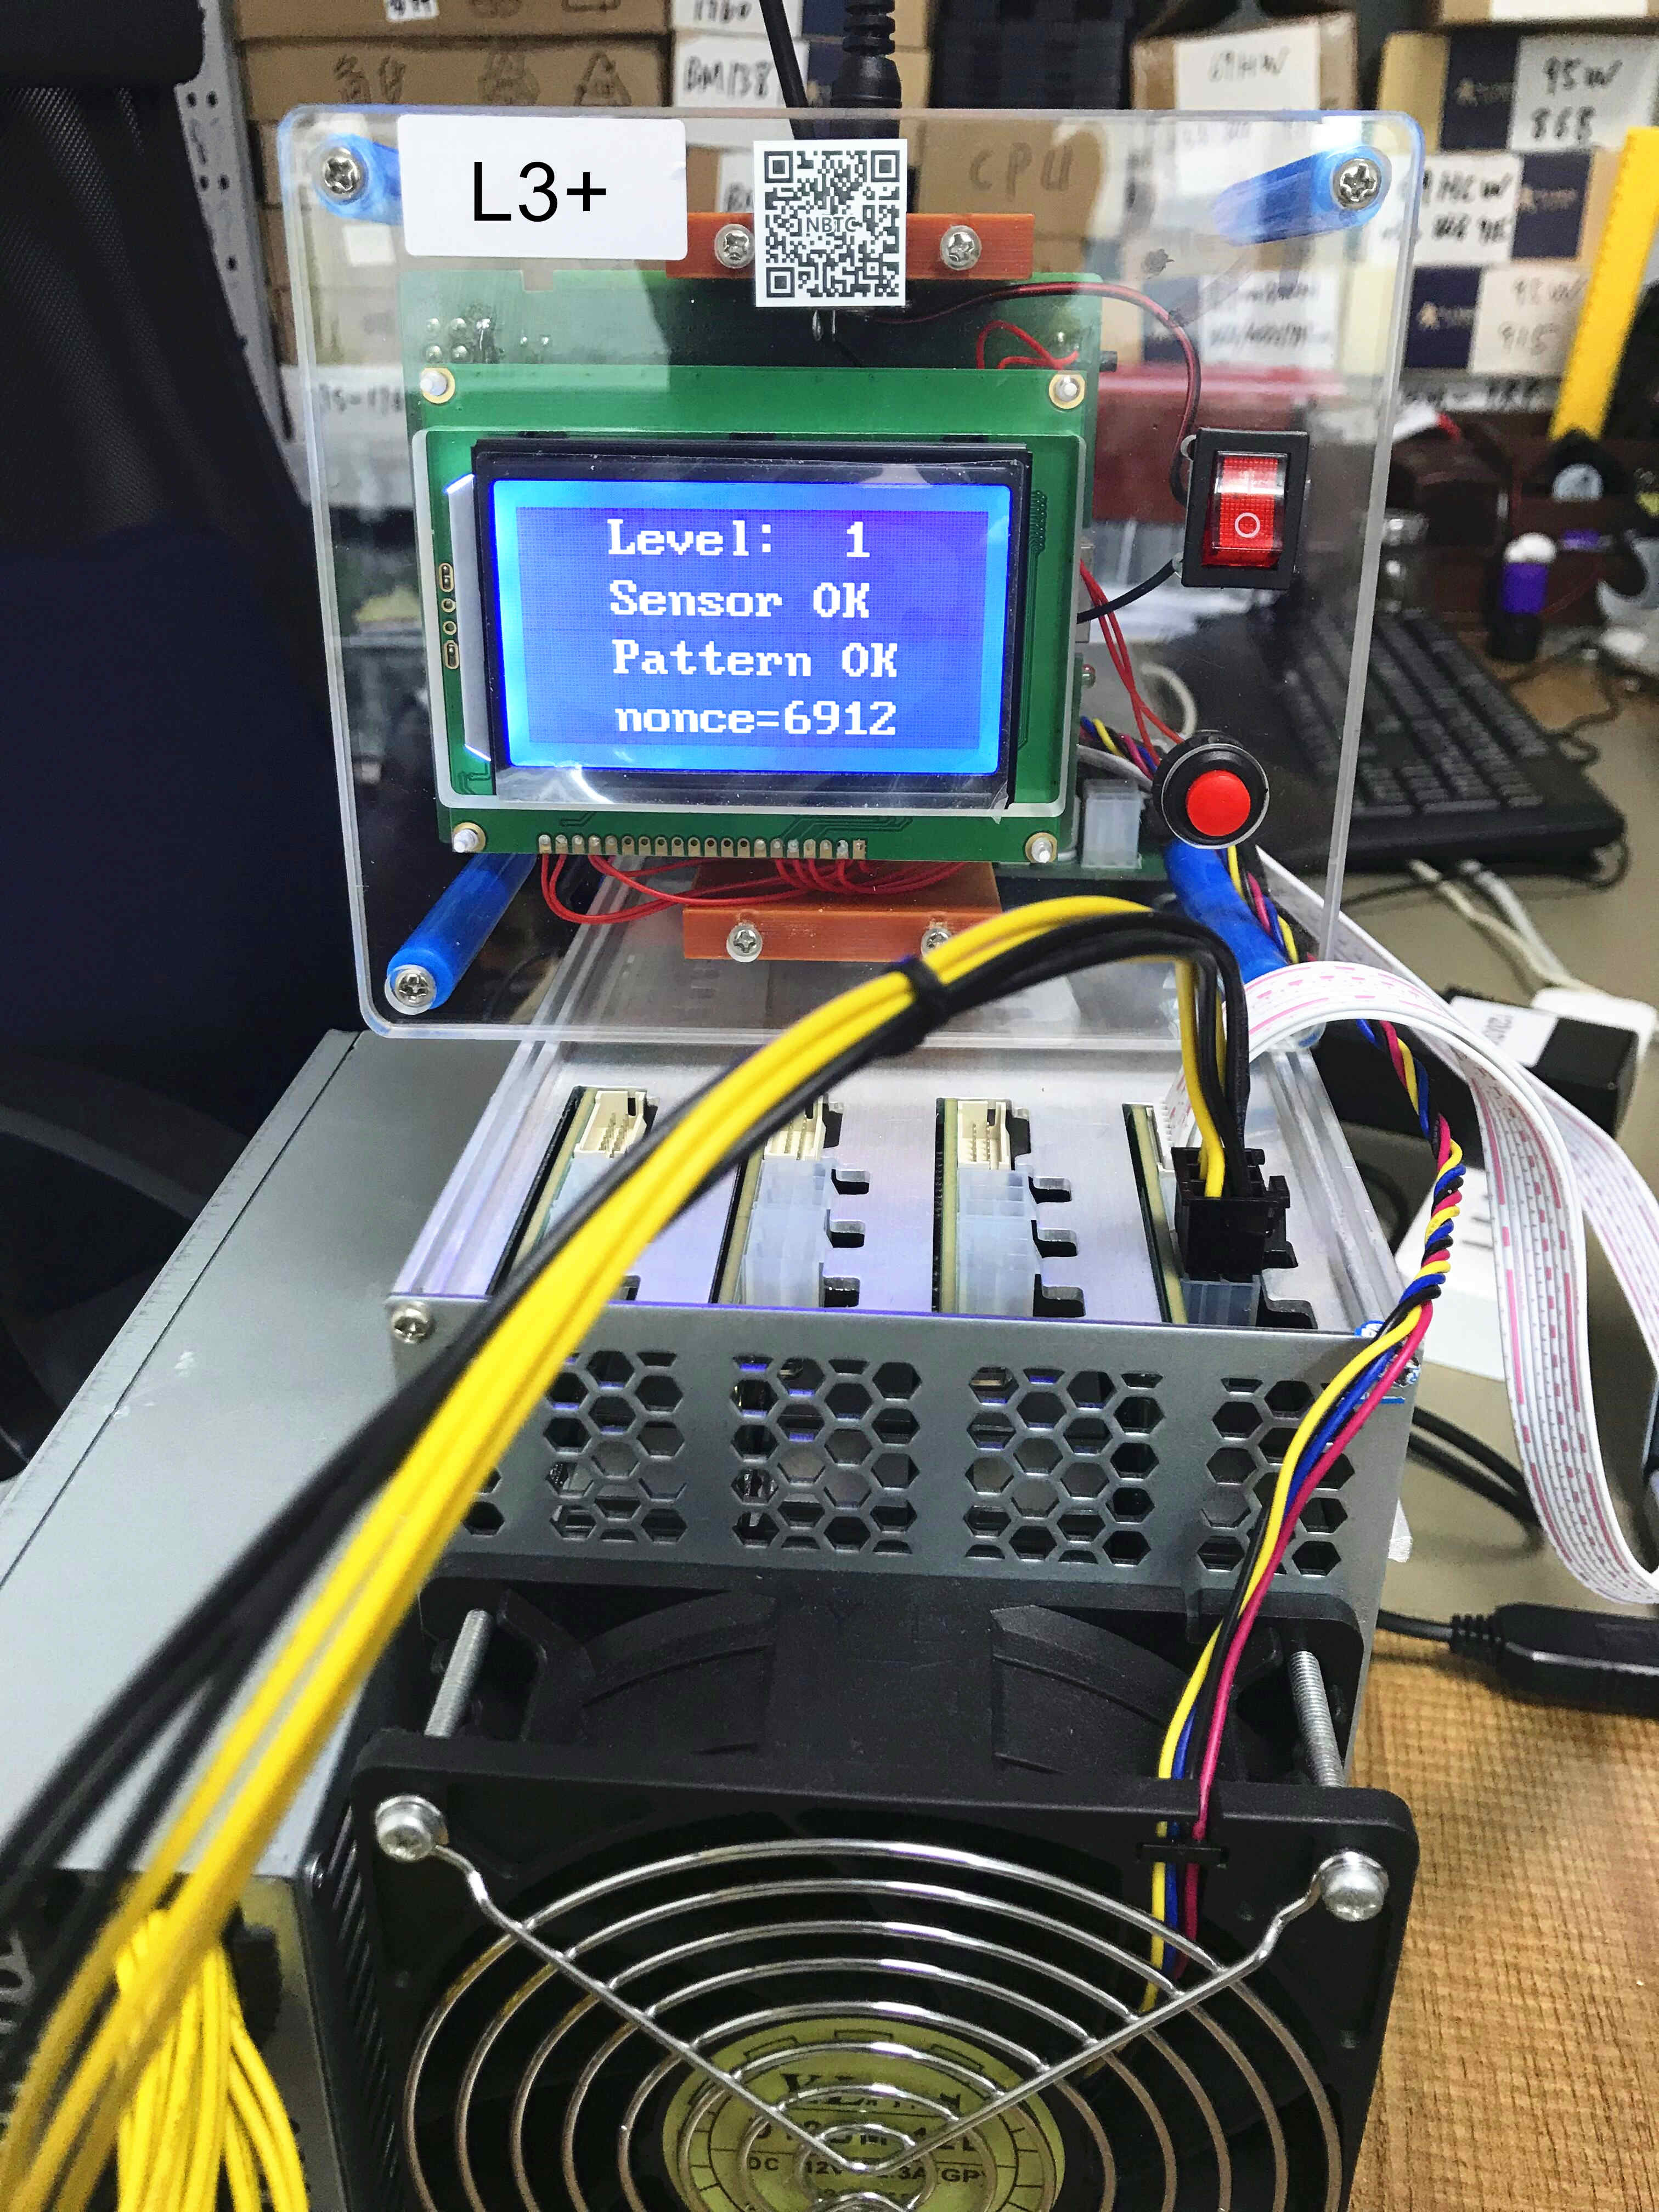 LTC مينر اختبار تركيبات L3 + hash مجلس اختبار إصلاح رقاقة BM1485 مع دليل إصلاح